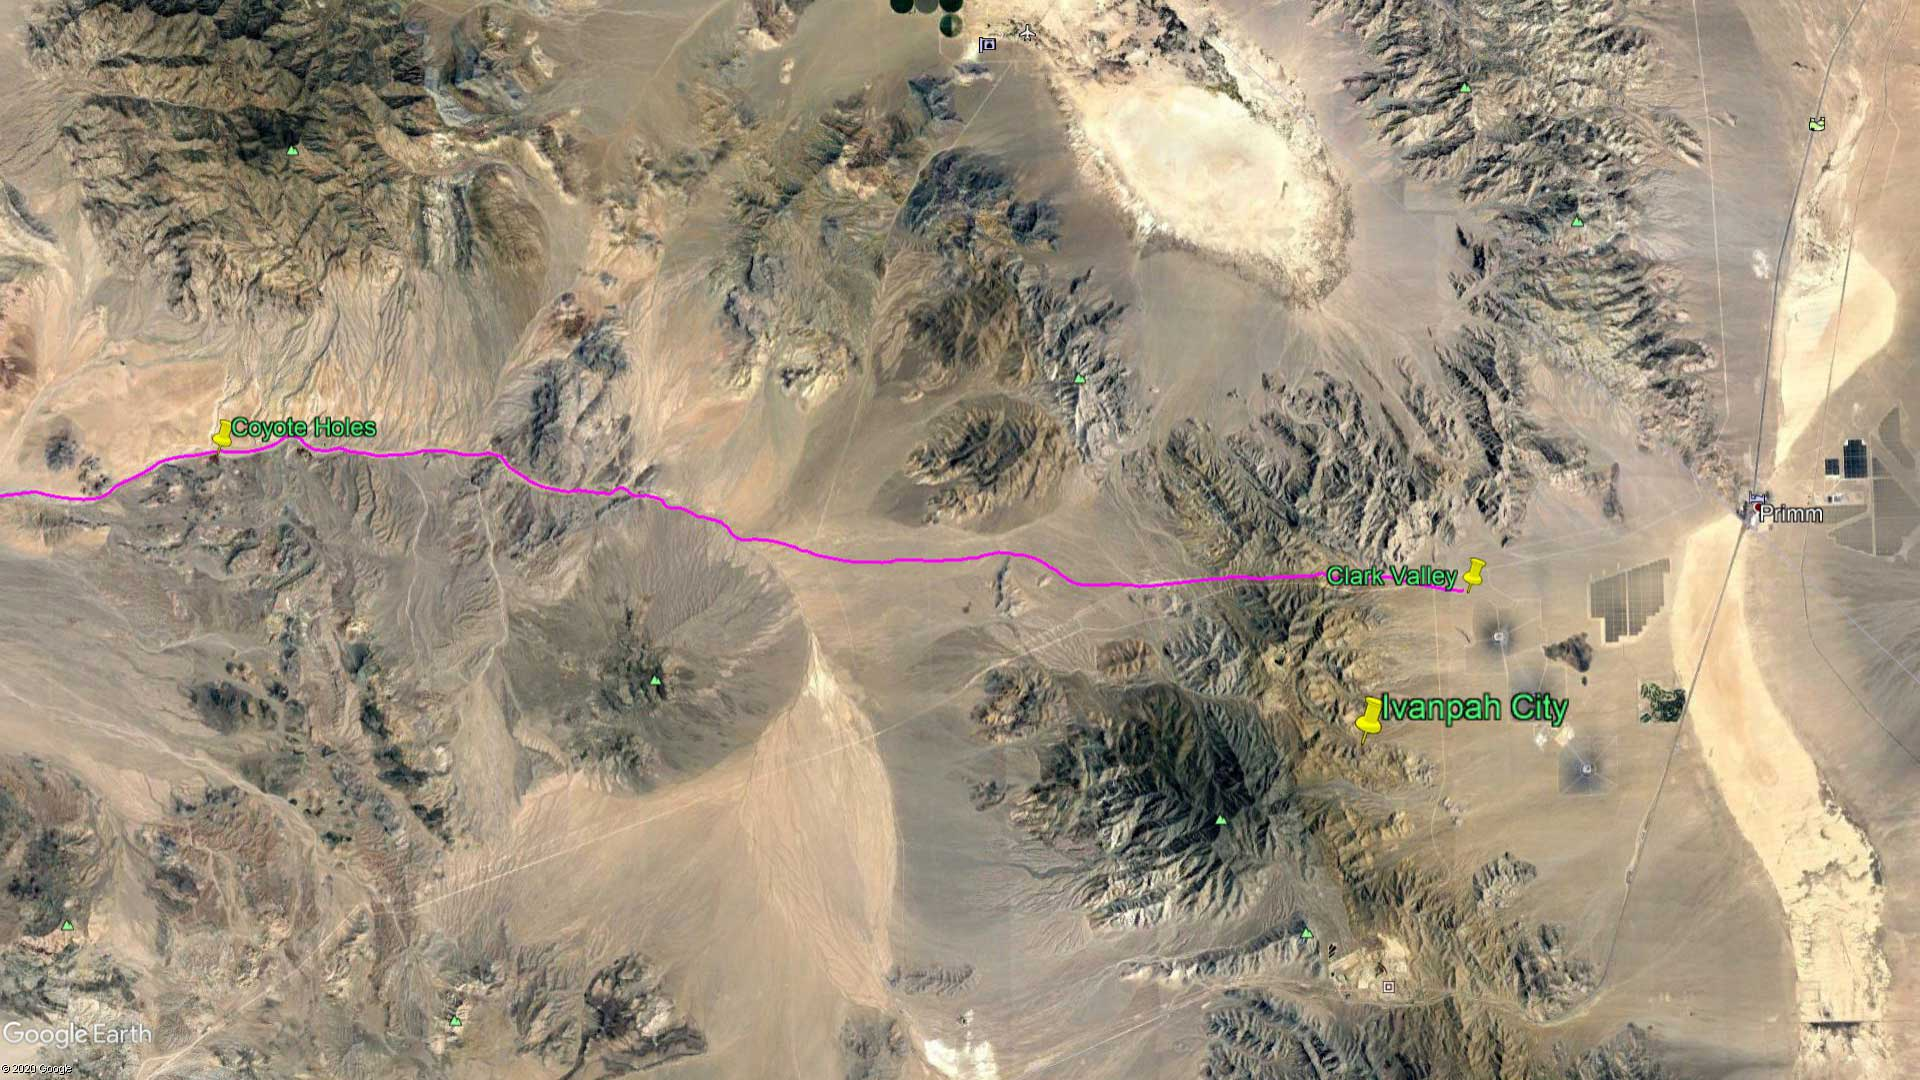 April 9, 1870 - The Mojave Desert